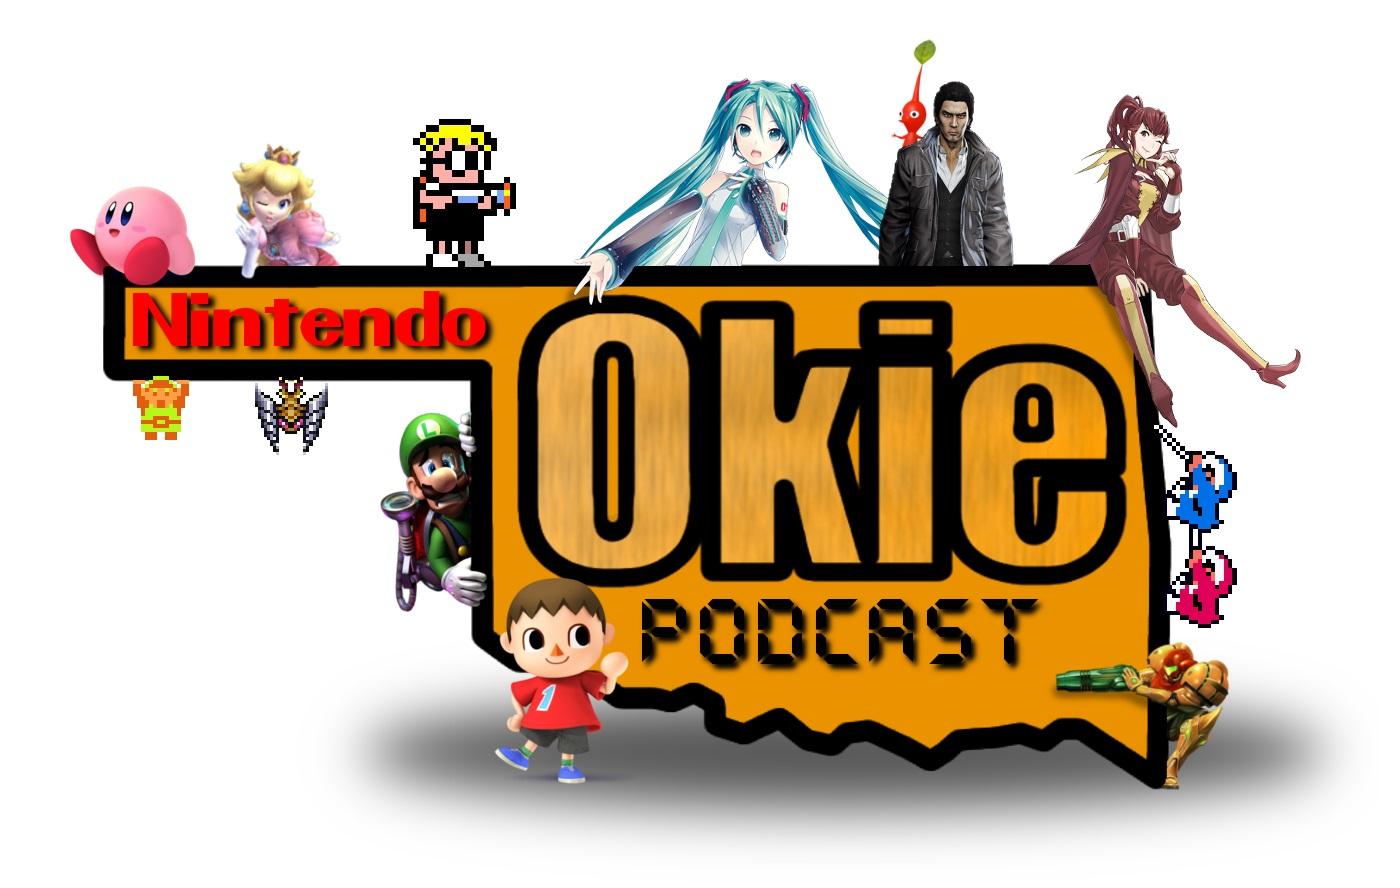 podcast logo 2-2-14